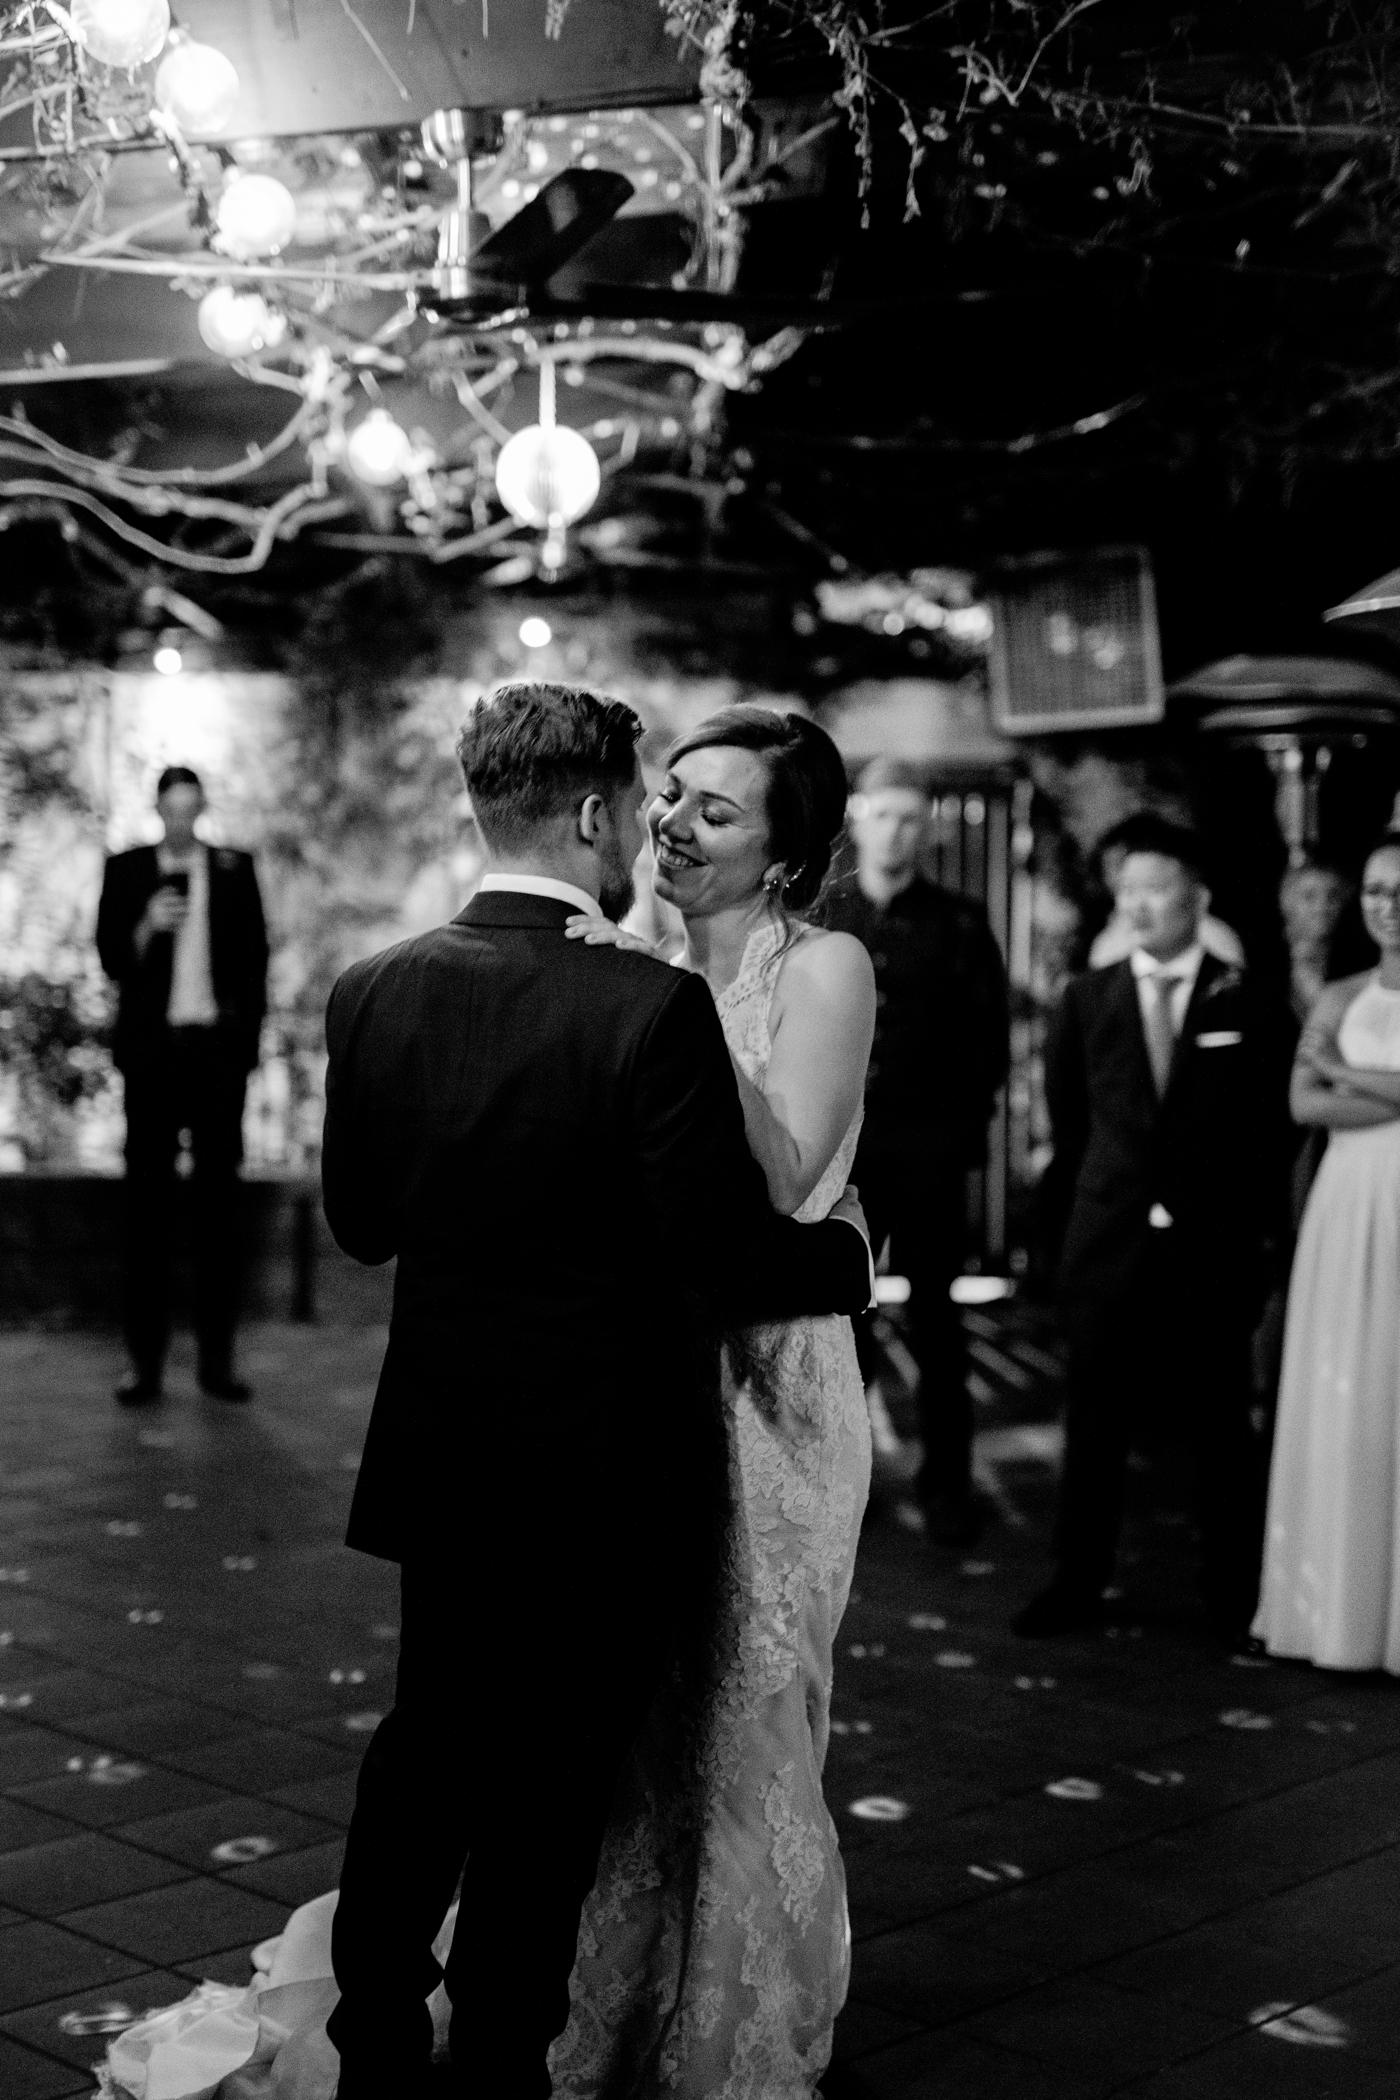 Erin & Ryan - Natural Wedding Photographer in Adelaide - Maximillians Wedding - Simple and Modern Wedding Photographer - Katherine Schultz - www.katherineschultzphotography.com_0063.jpg